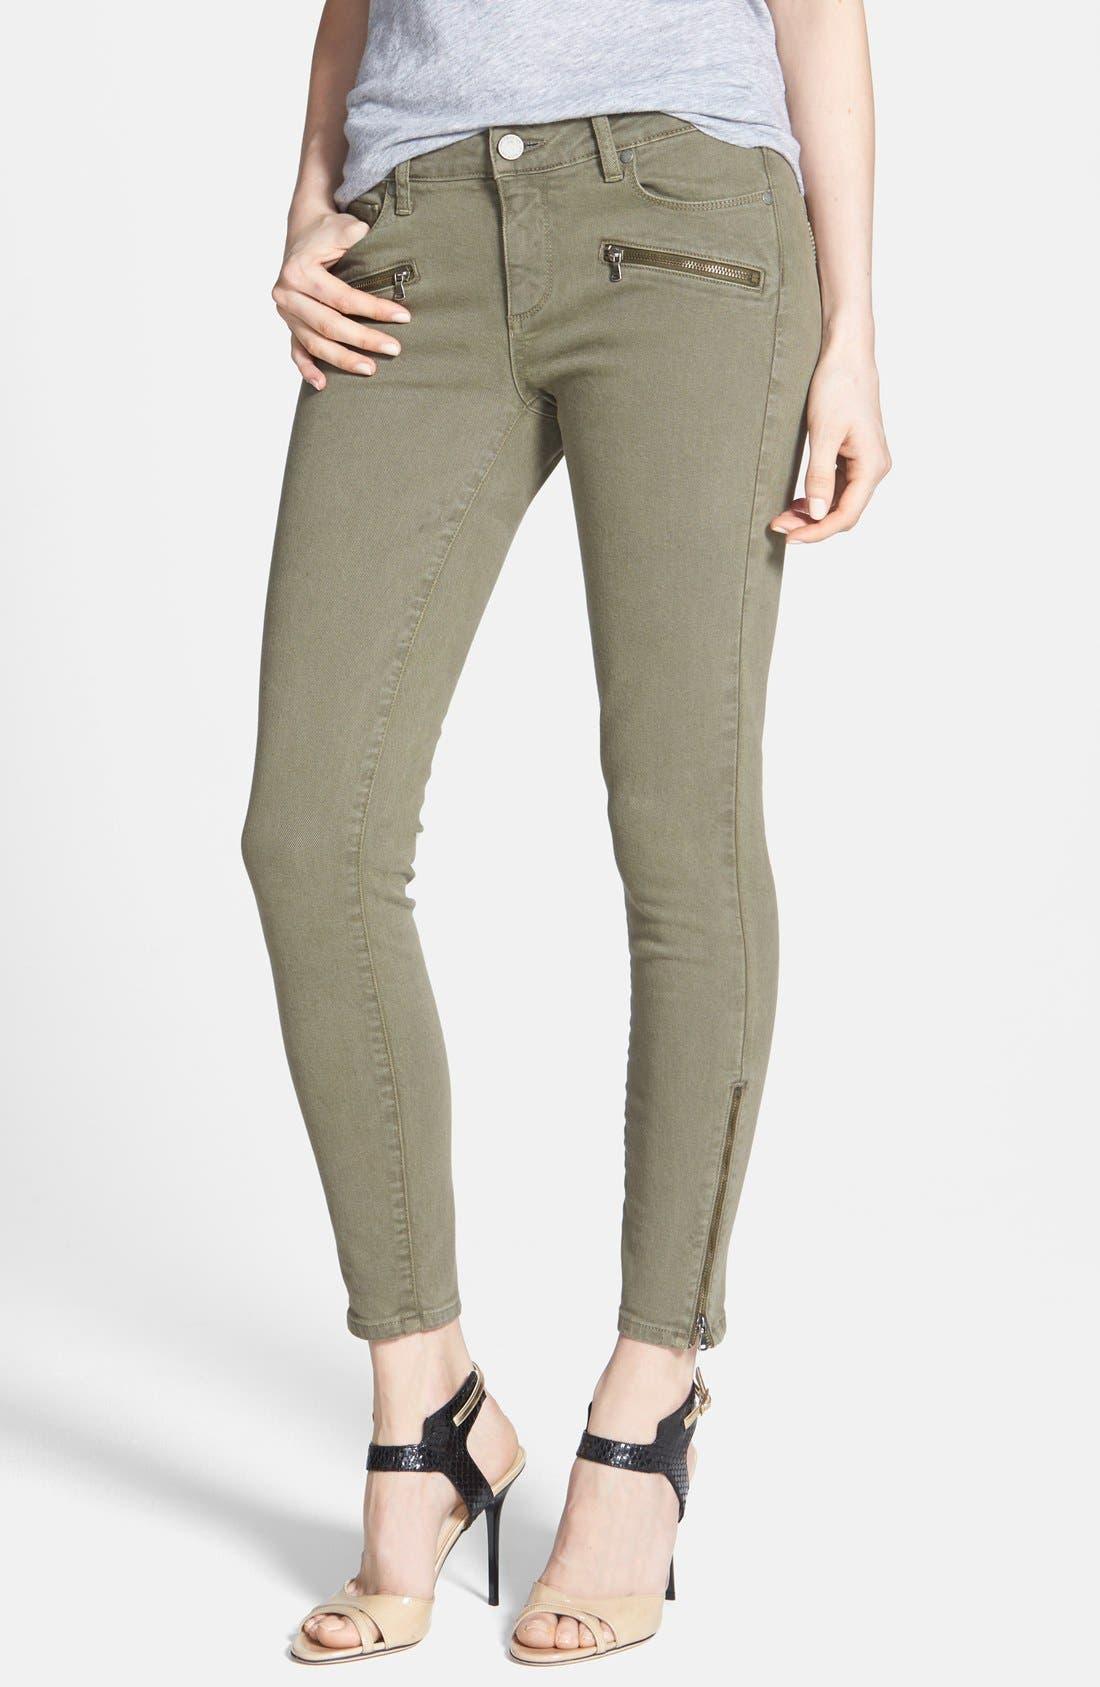 Alternate Image 1 Selected - Paige Denim 'Jane' Zip Detail Ultra Skinny Ankle Jeans (Fatigue Green)